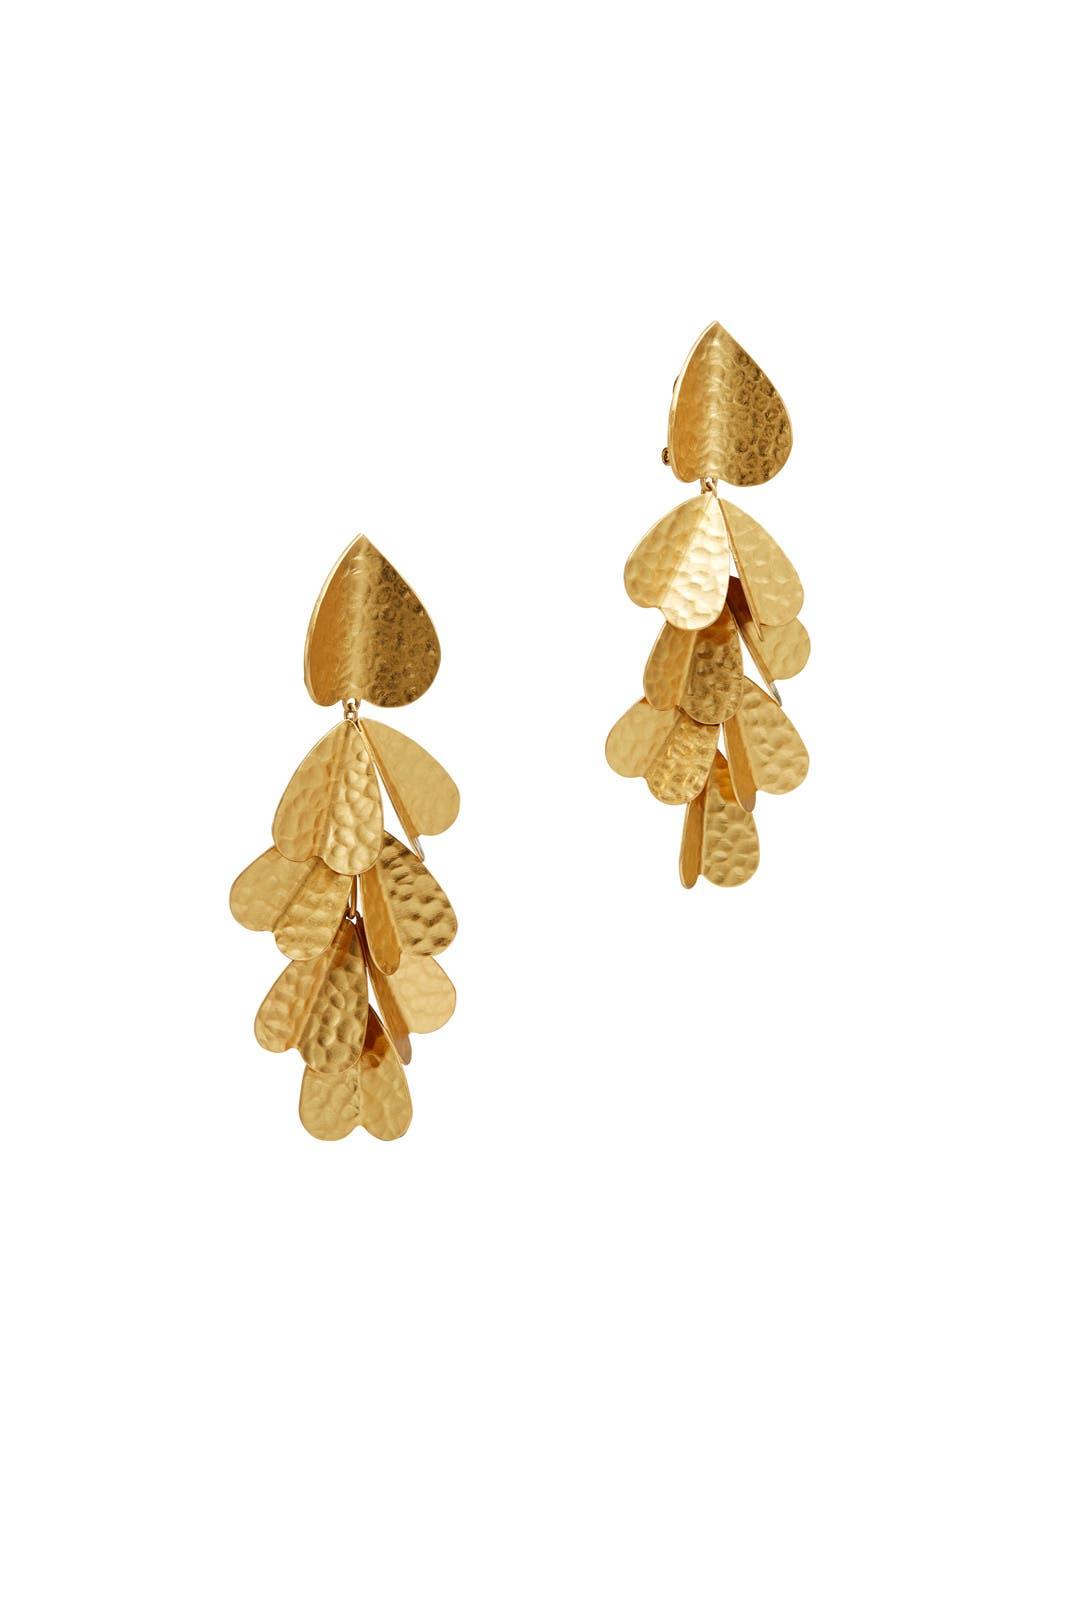 cf1ad33e0aa02 kate spade new york accessories Petal Statement Earrings